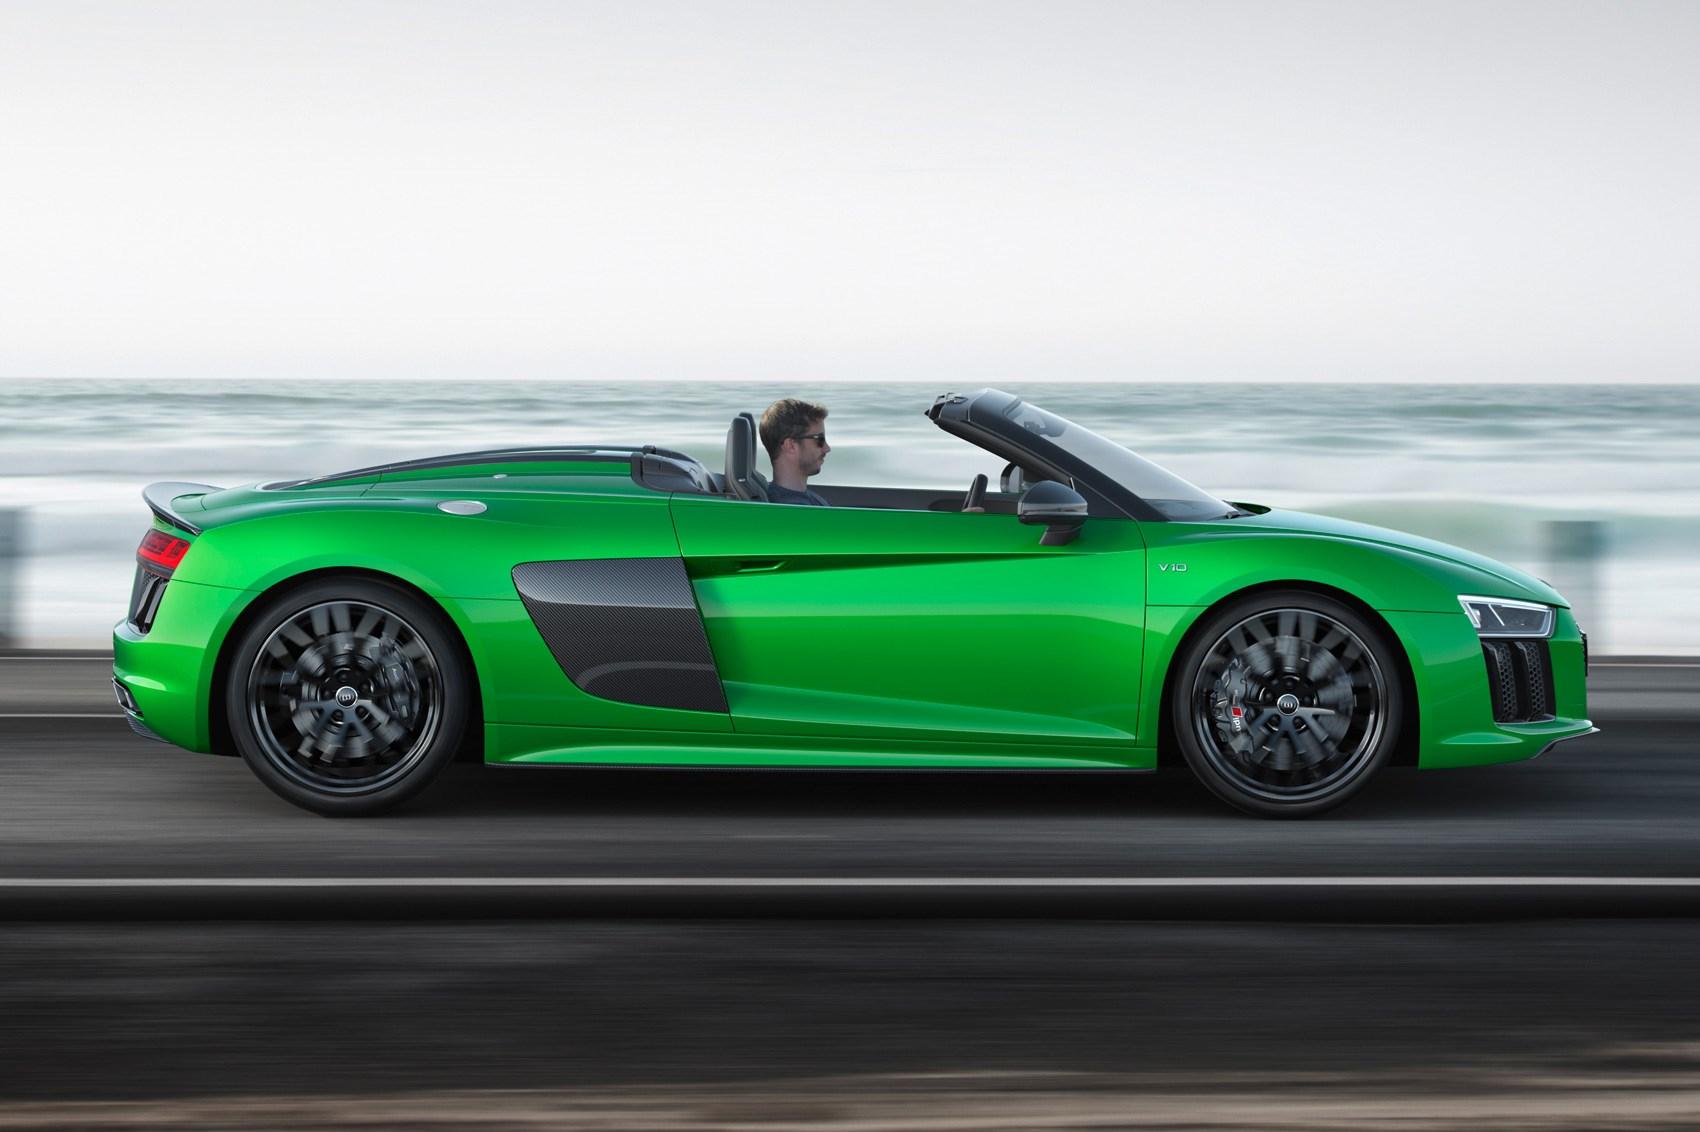 Audi r8 green